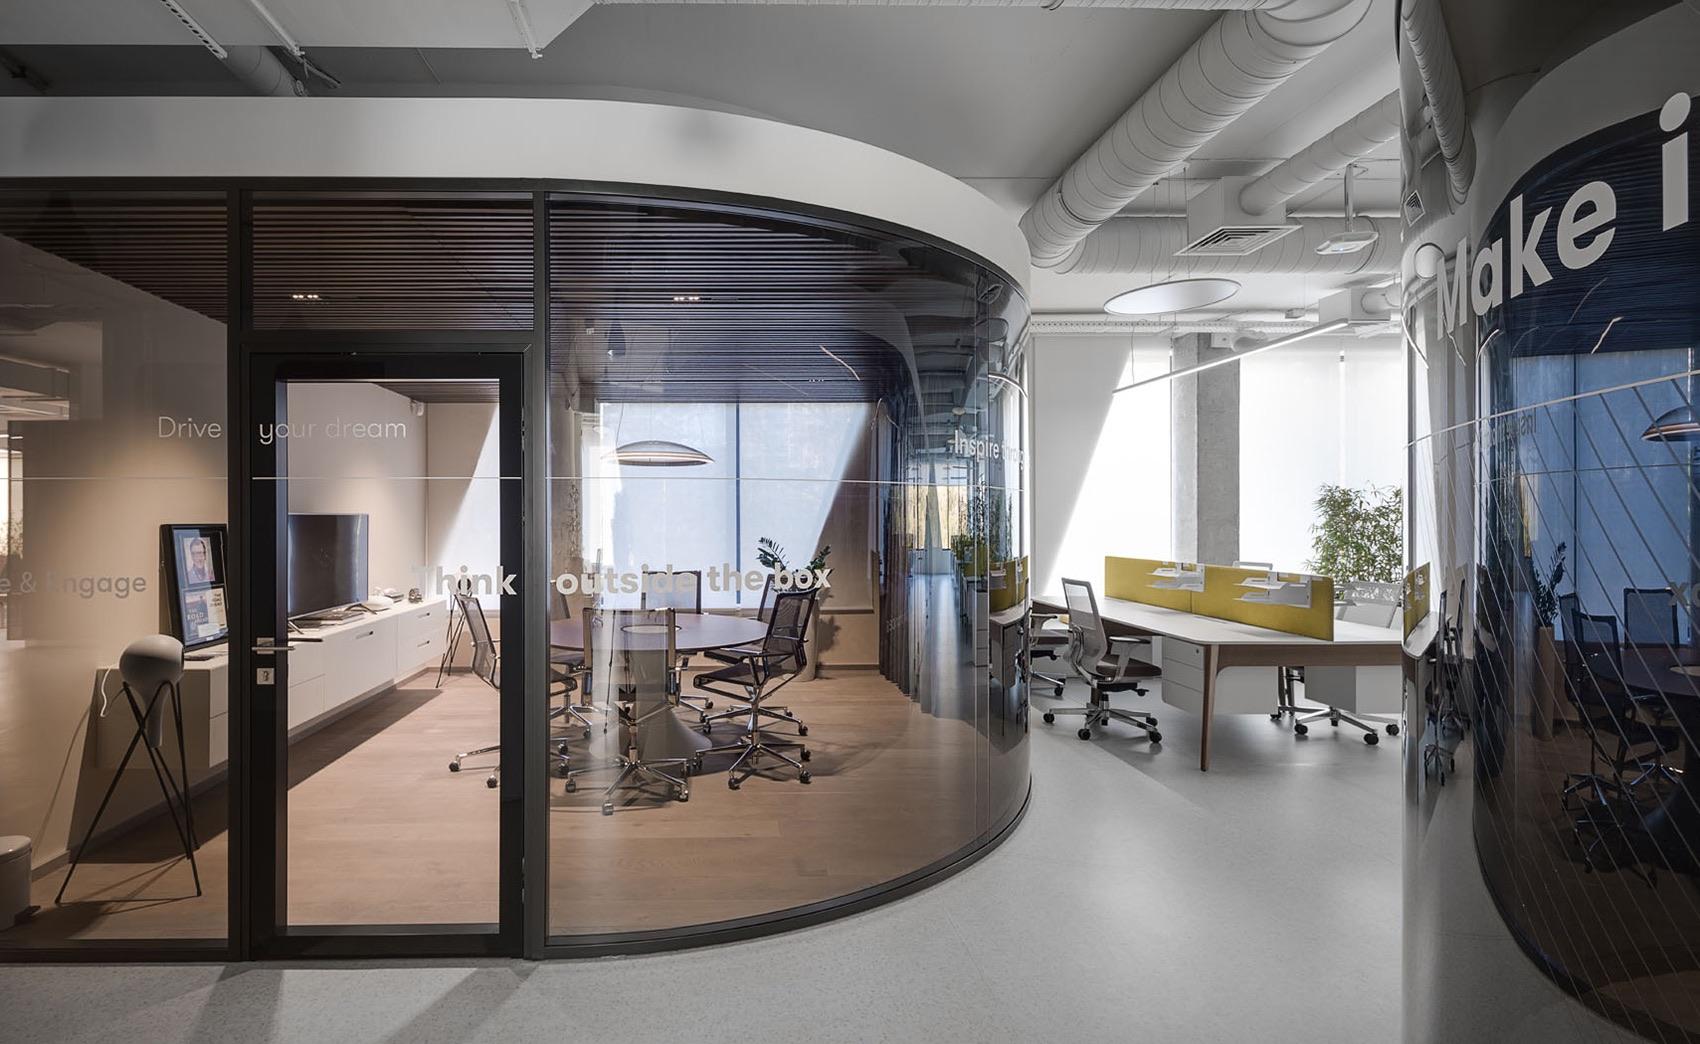 biosphere-corporation-office-3